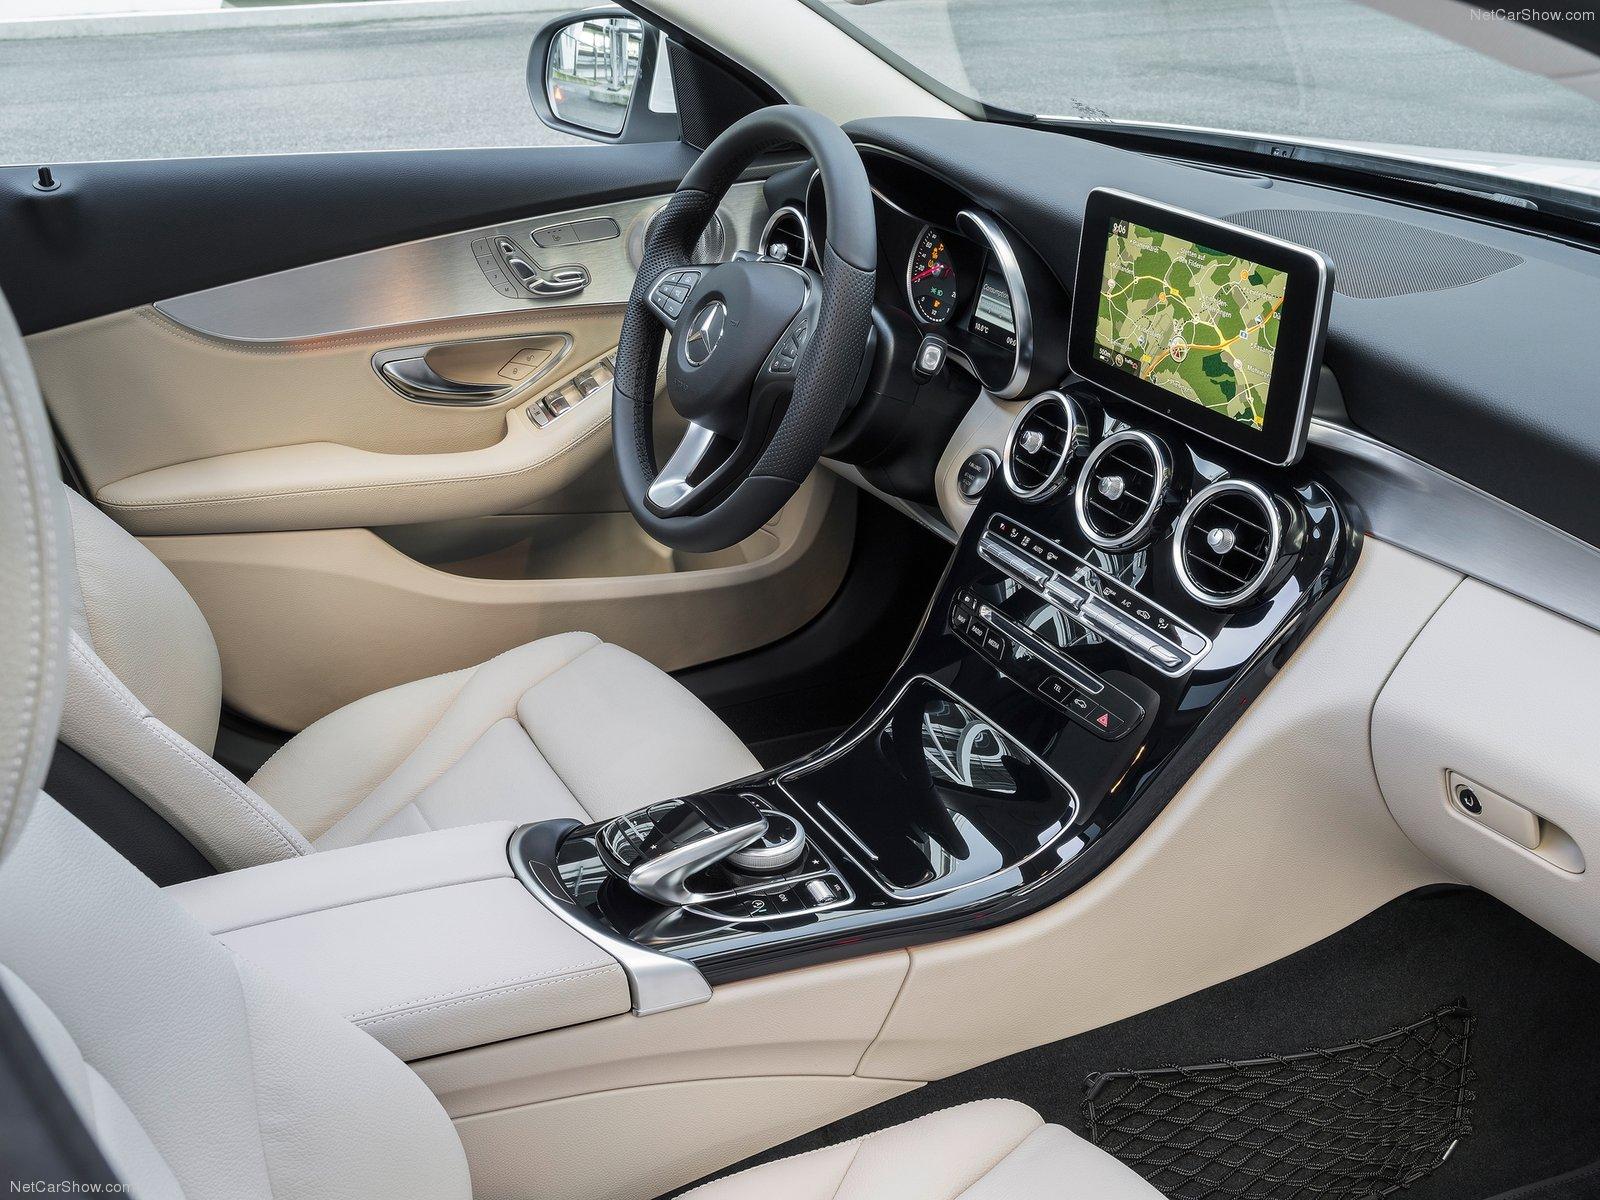 Mercedes-Benz C-Class photos - Photo Gallery Page #8| CarsBase.com